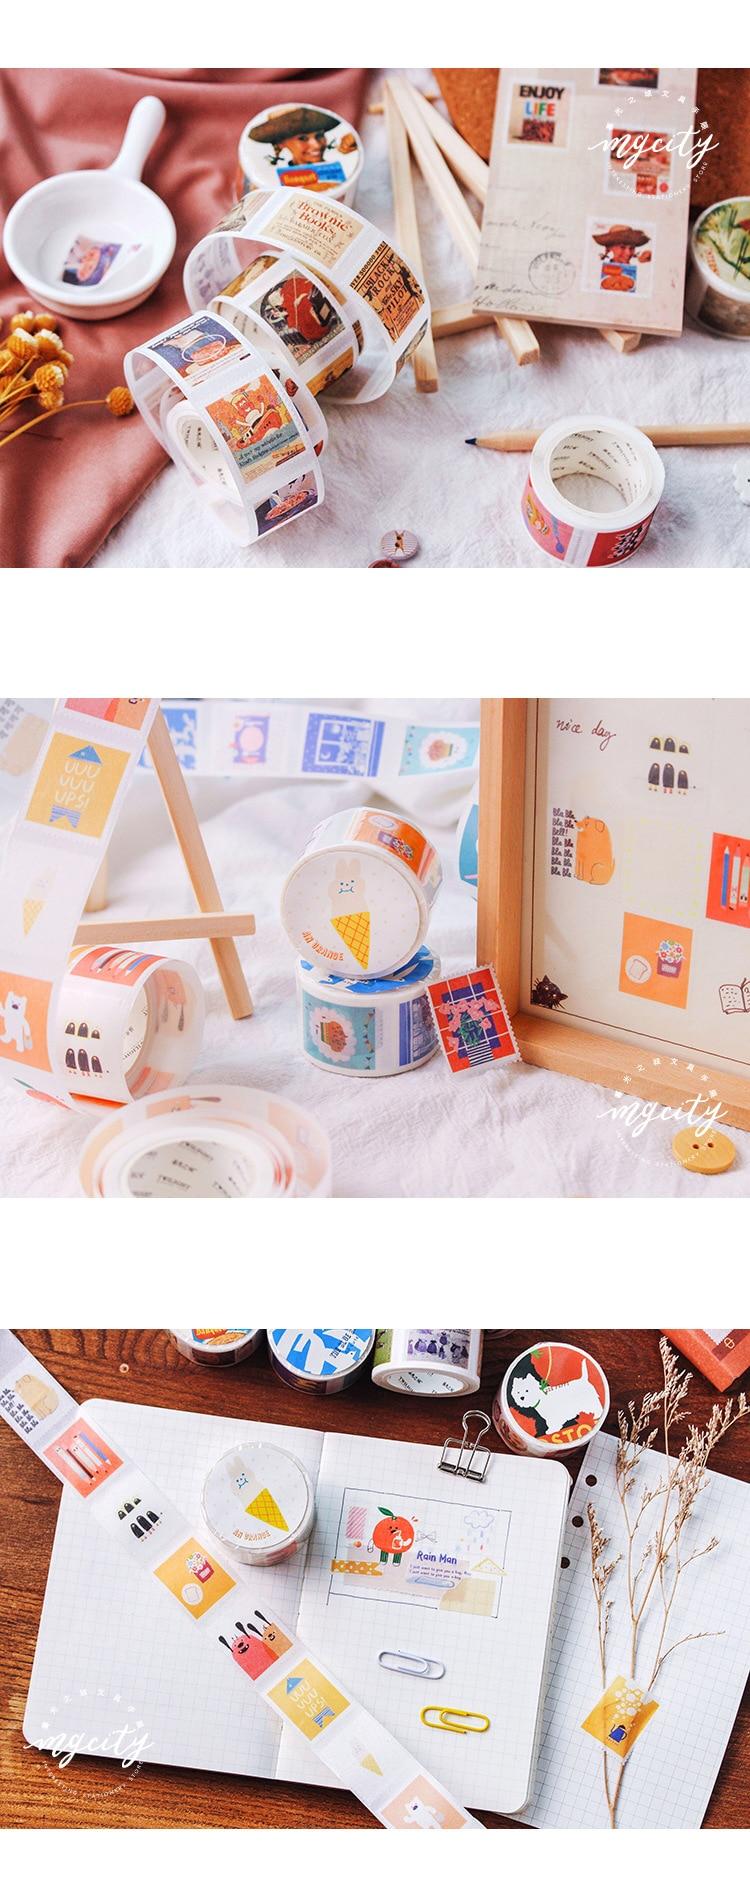 adesiva mini selo adesivo série washi fita fita adesiva adesivos